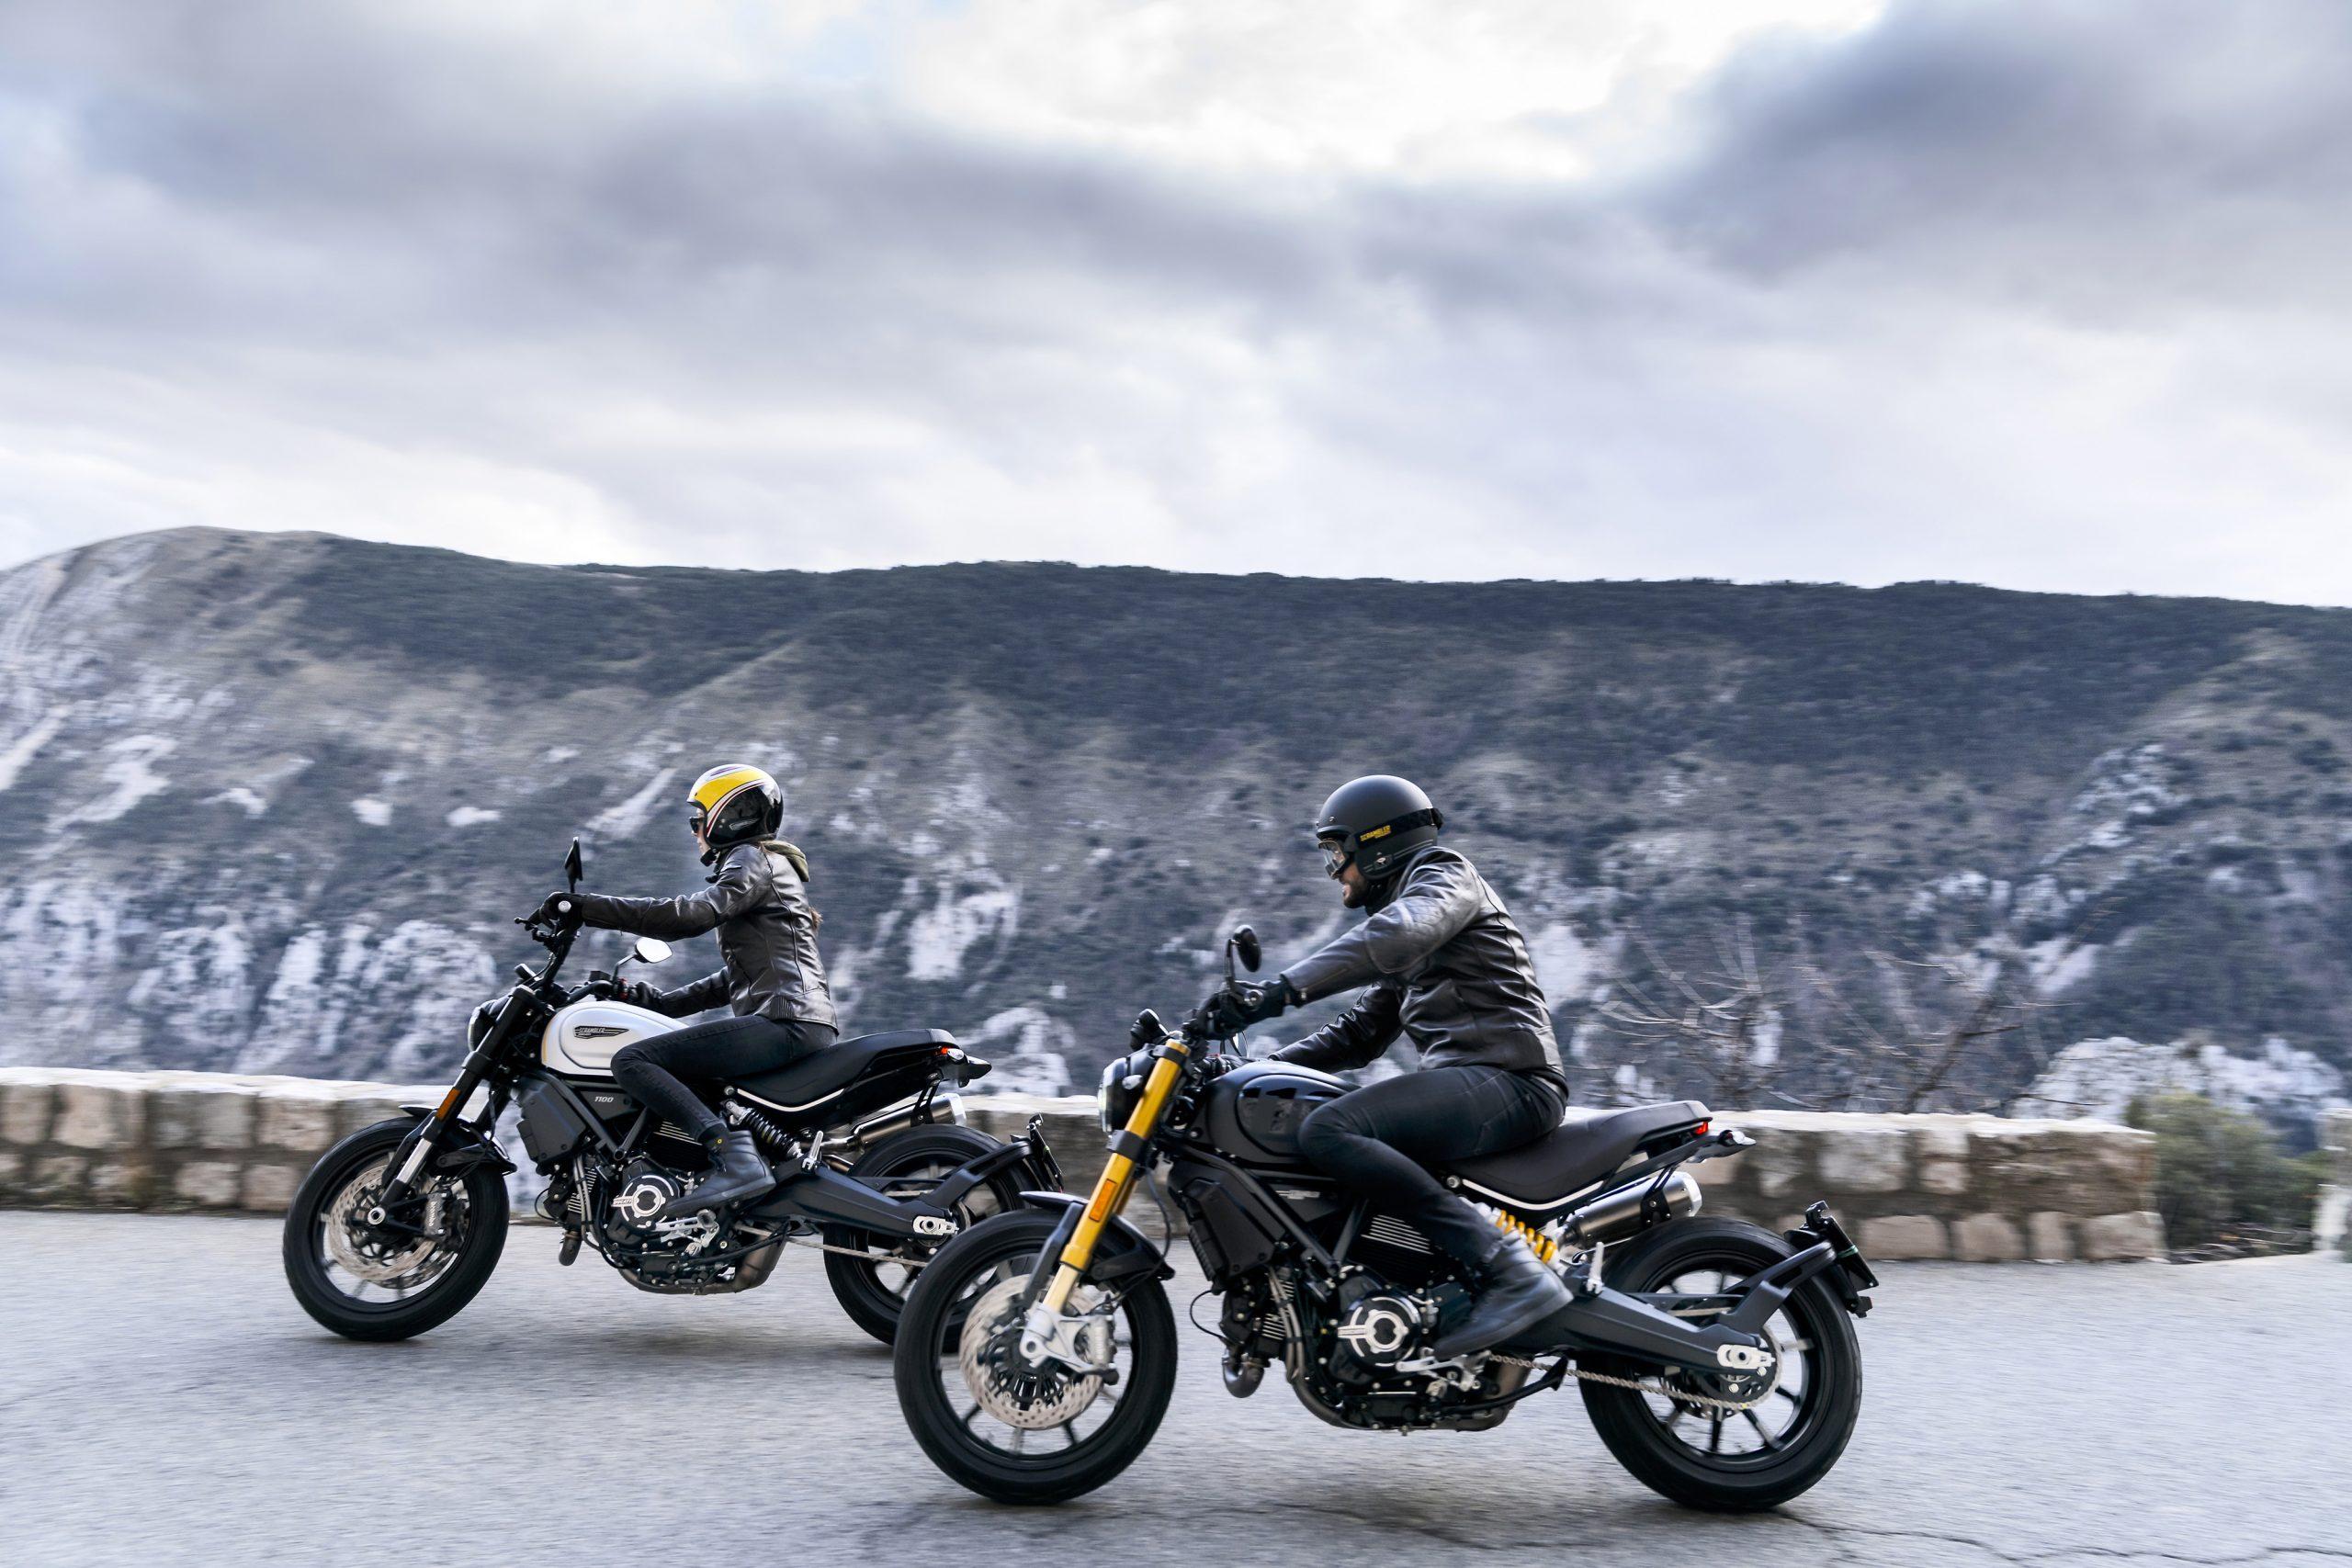 Ducati Scrambler 1100 Pro and 1100 Sport Pro